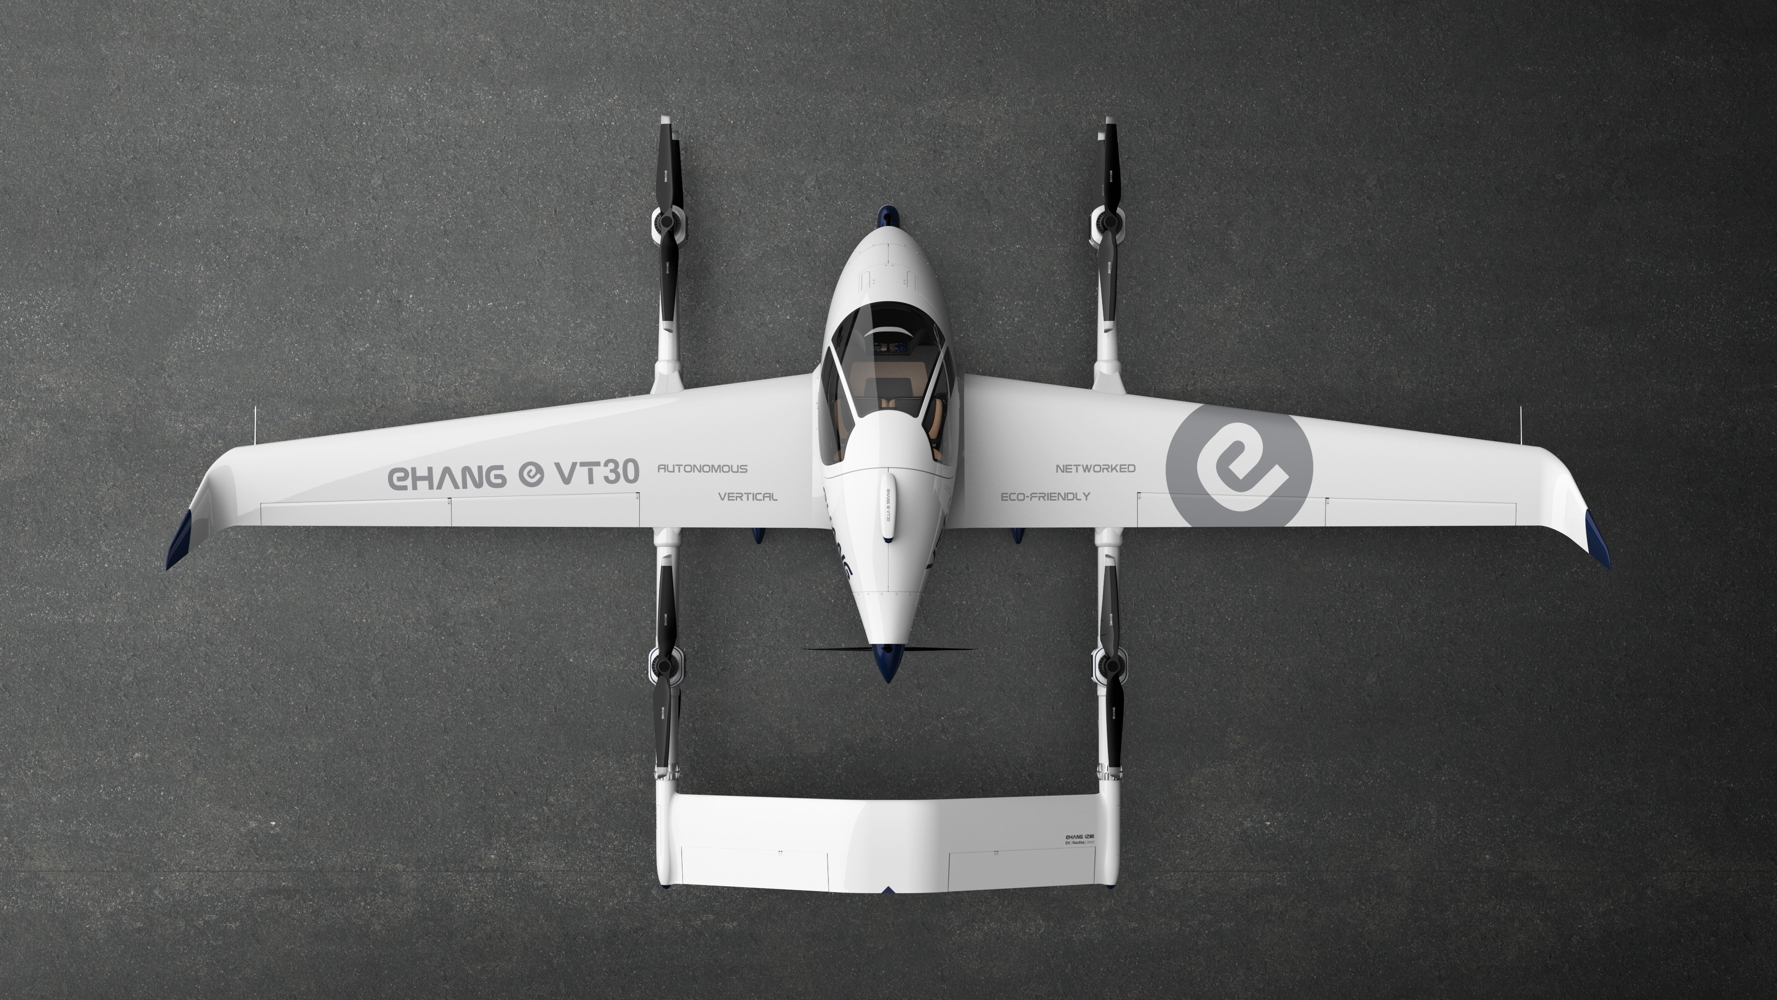 EHang VT-30